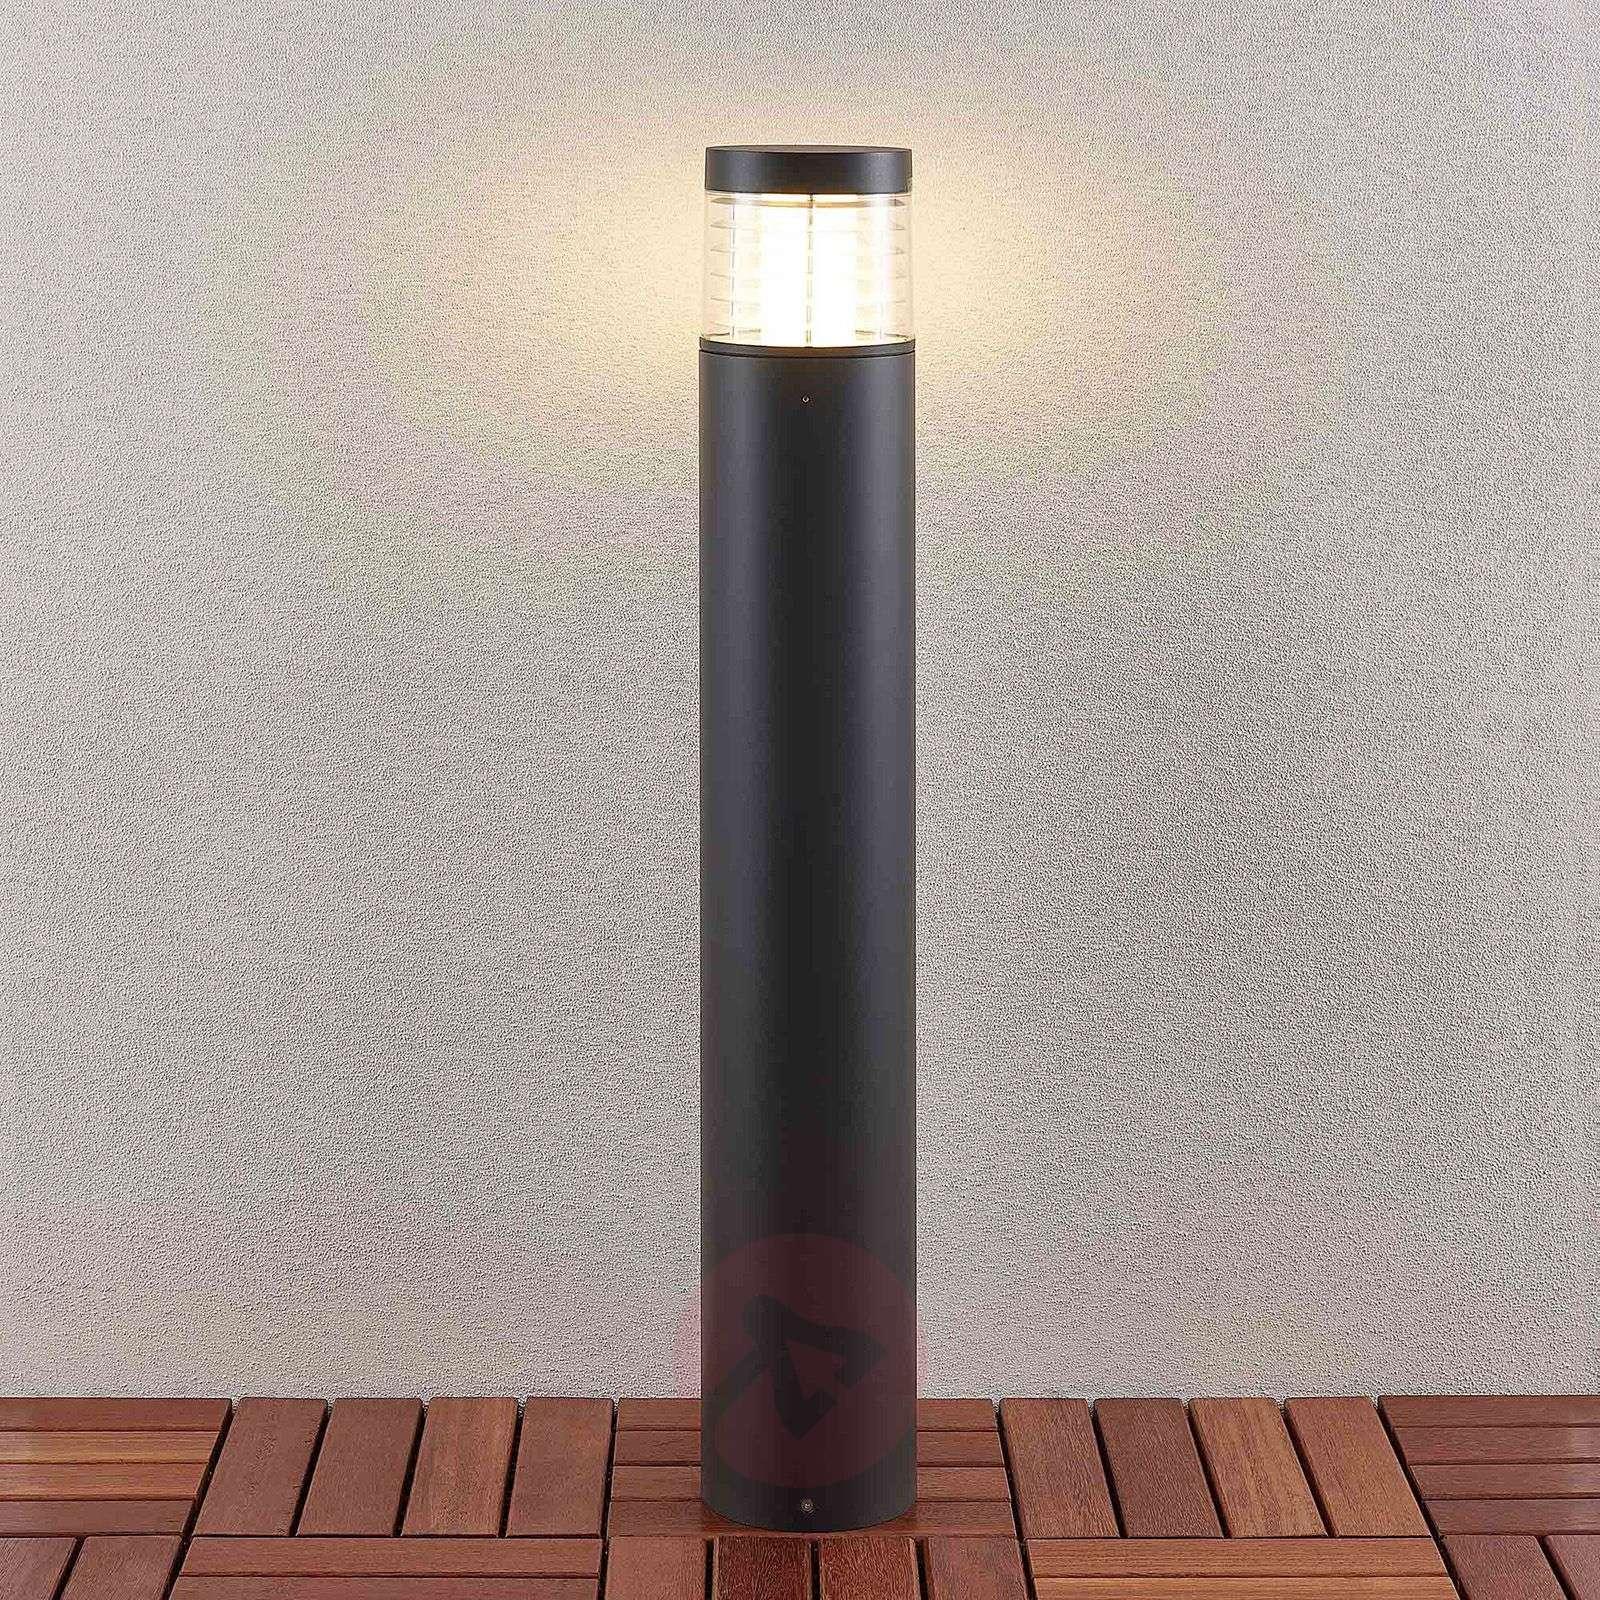 LED-pollarivalaisin Jaxon ristikkovarjostin 100cm-9969123-02